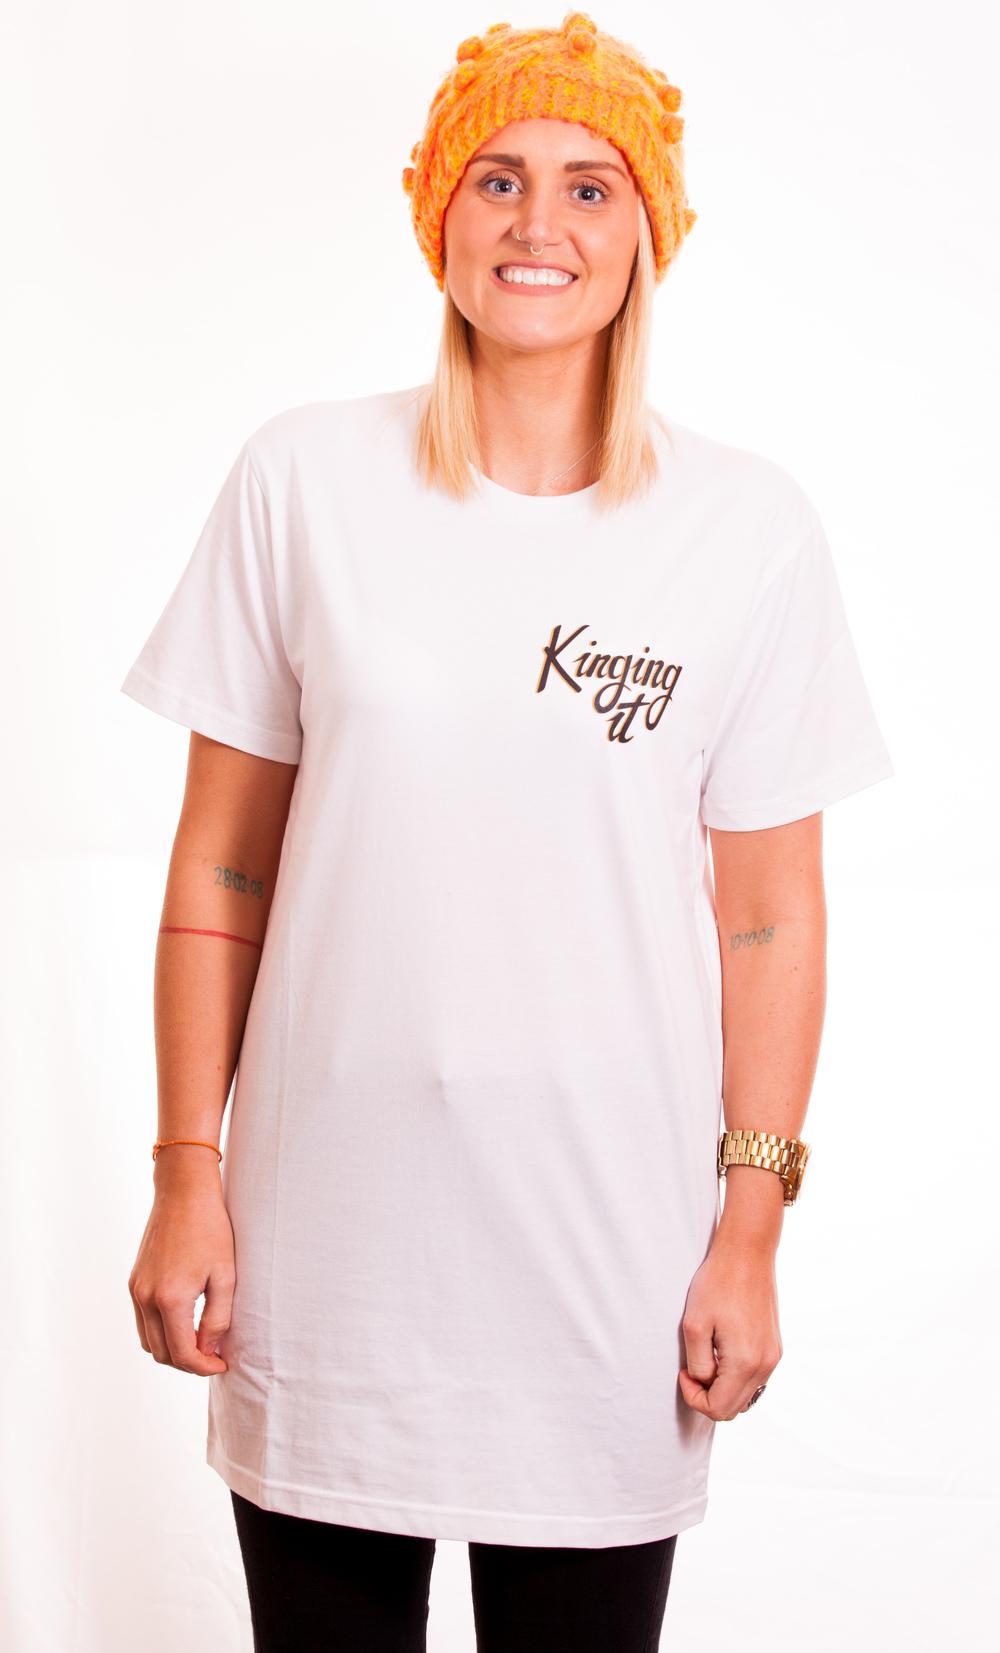 T shirt design queenstown -  These Kids Wear Crowns Tall T Shirt White Unisex